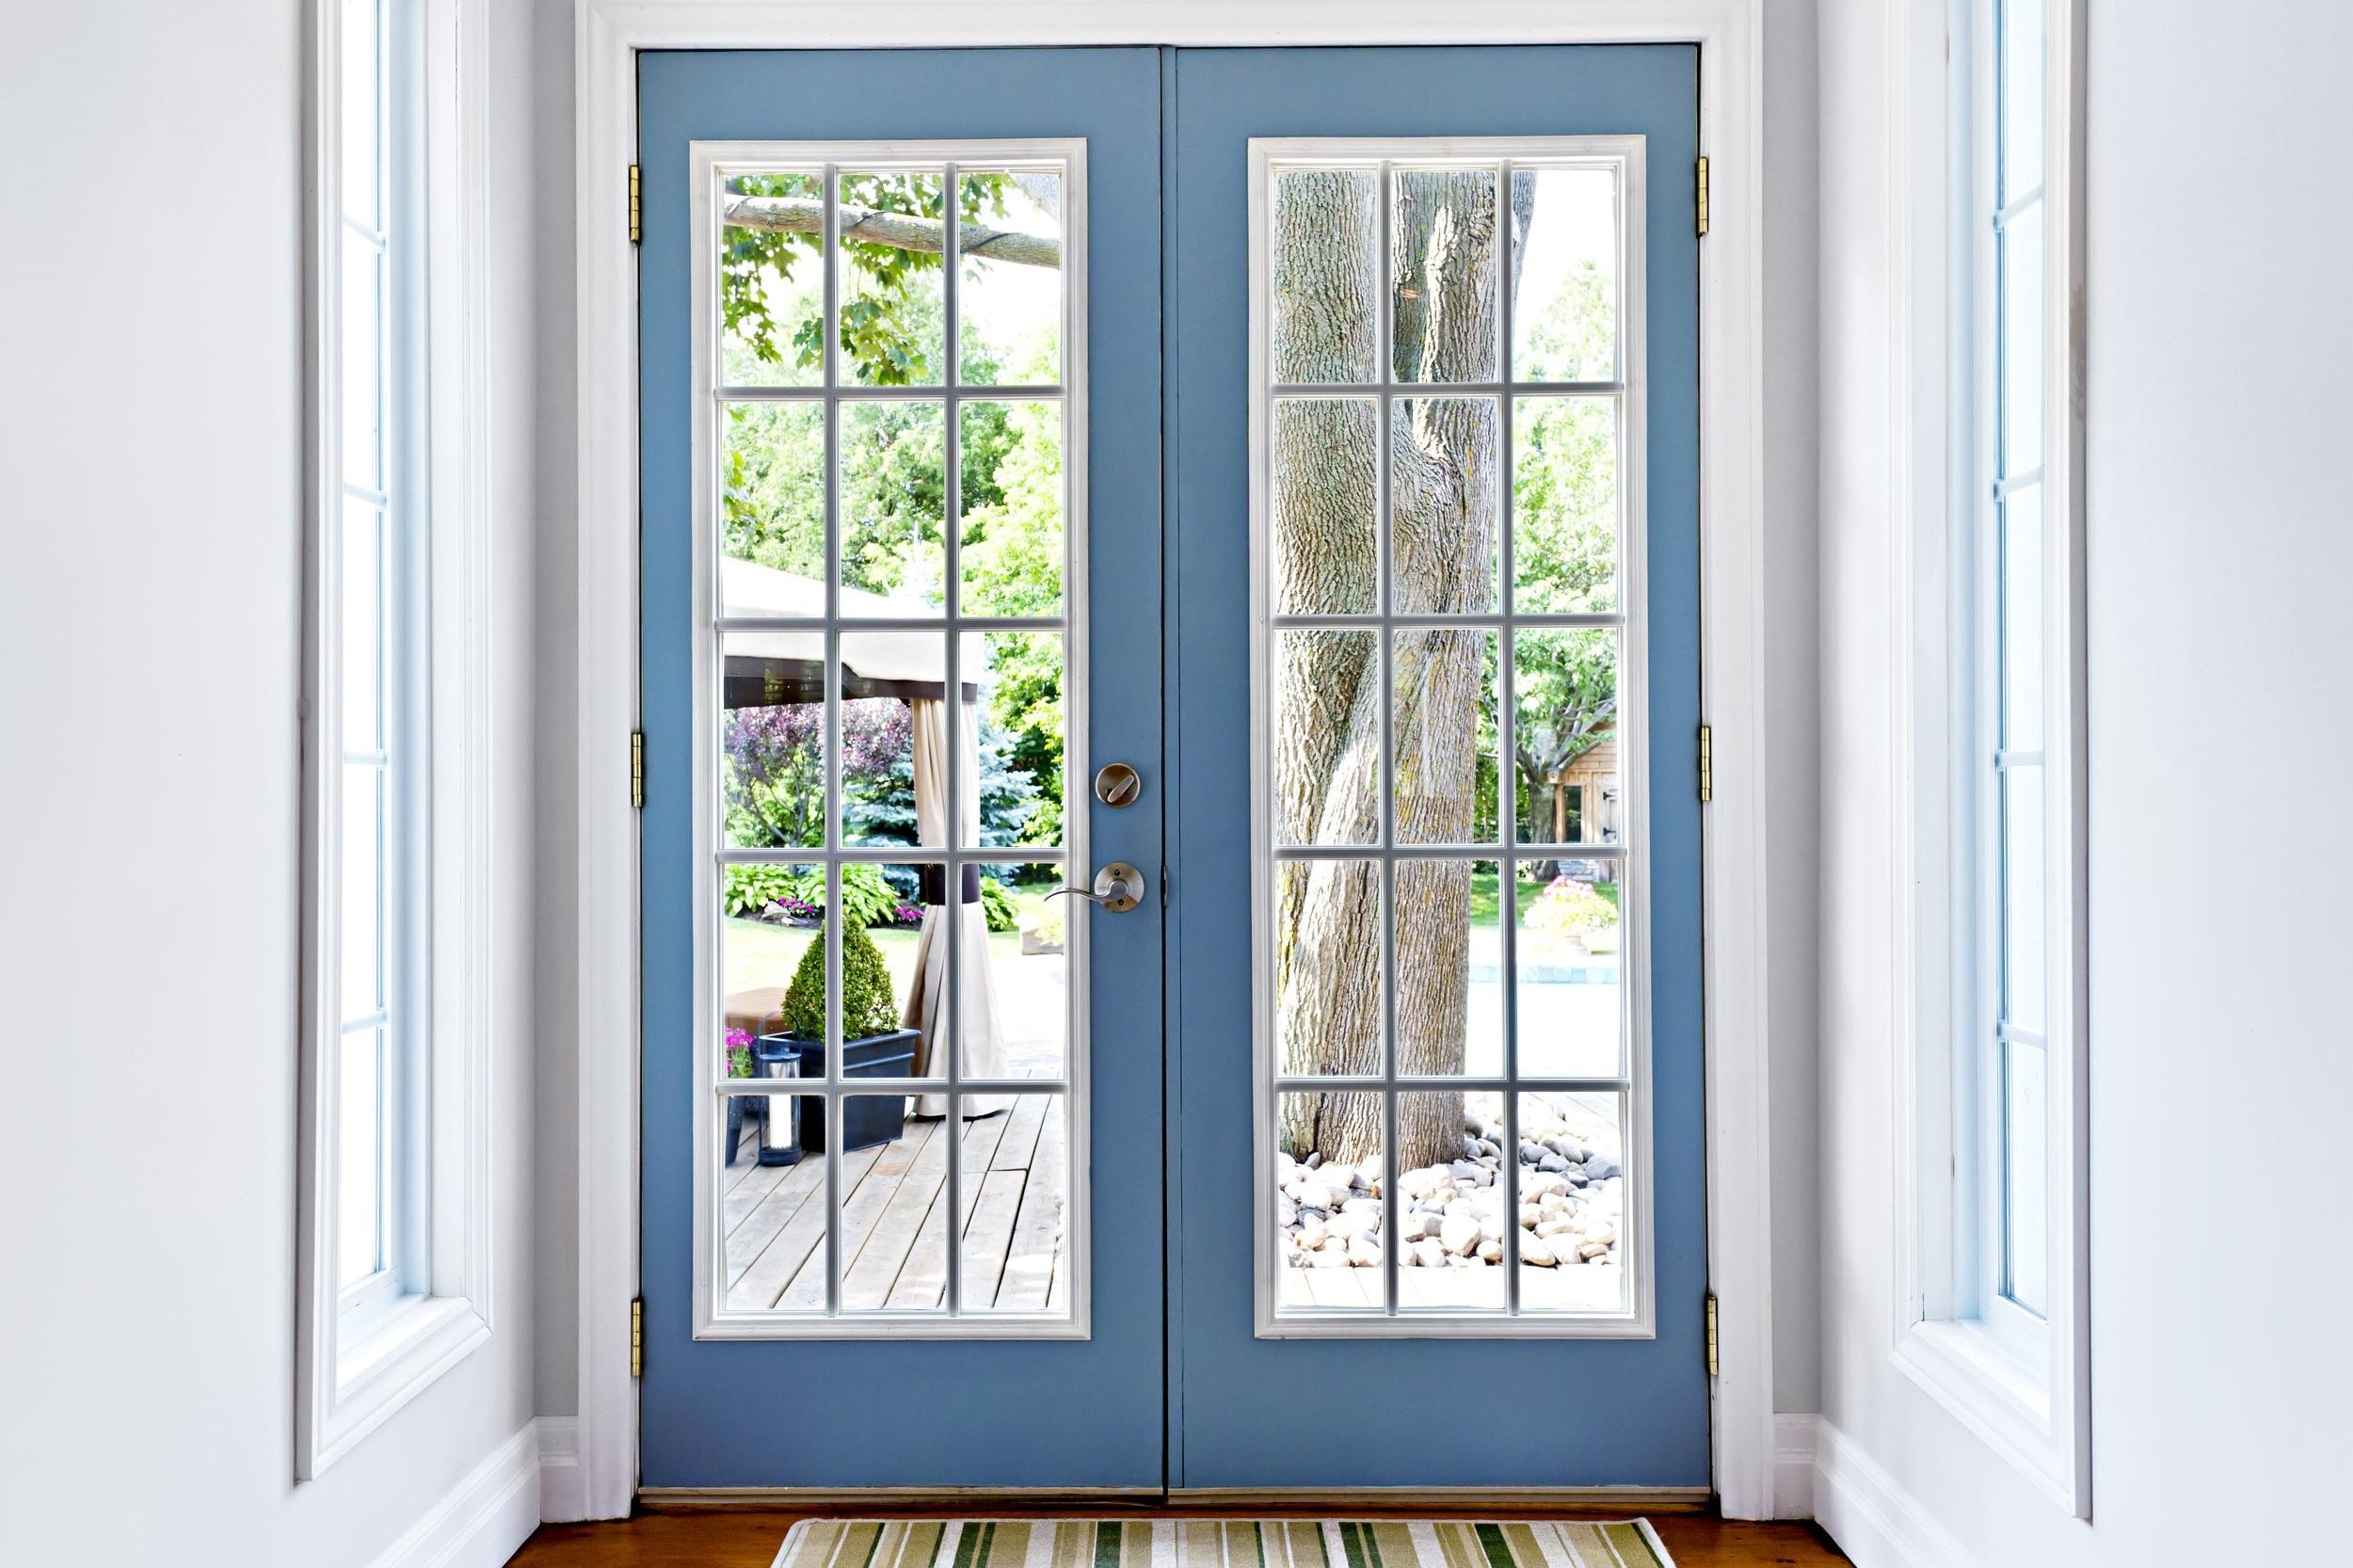 We specialize in window glass replacement, patio sliding glass doors, & glass shower doors. -